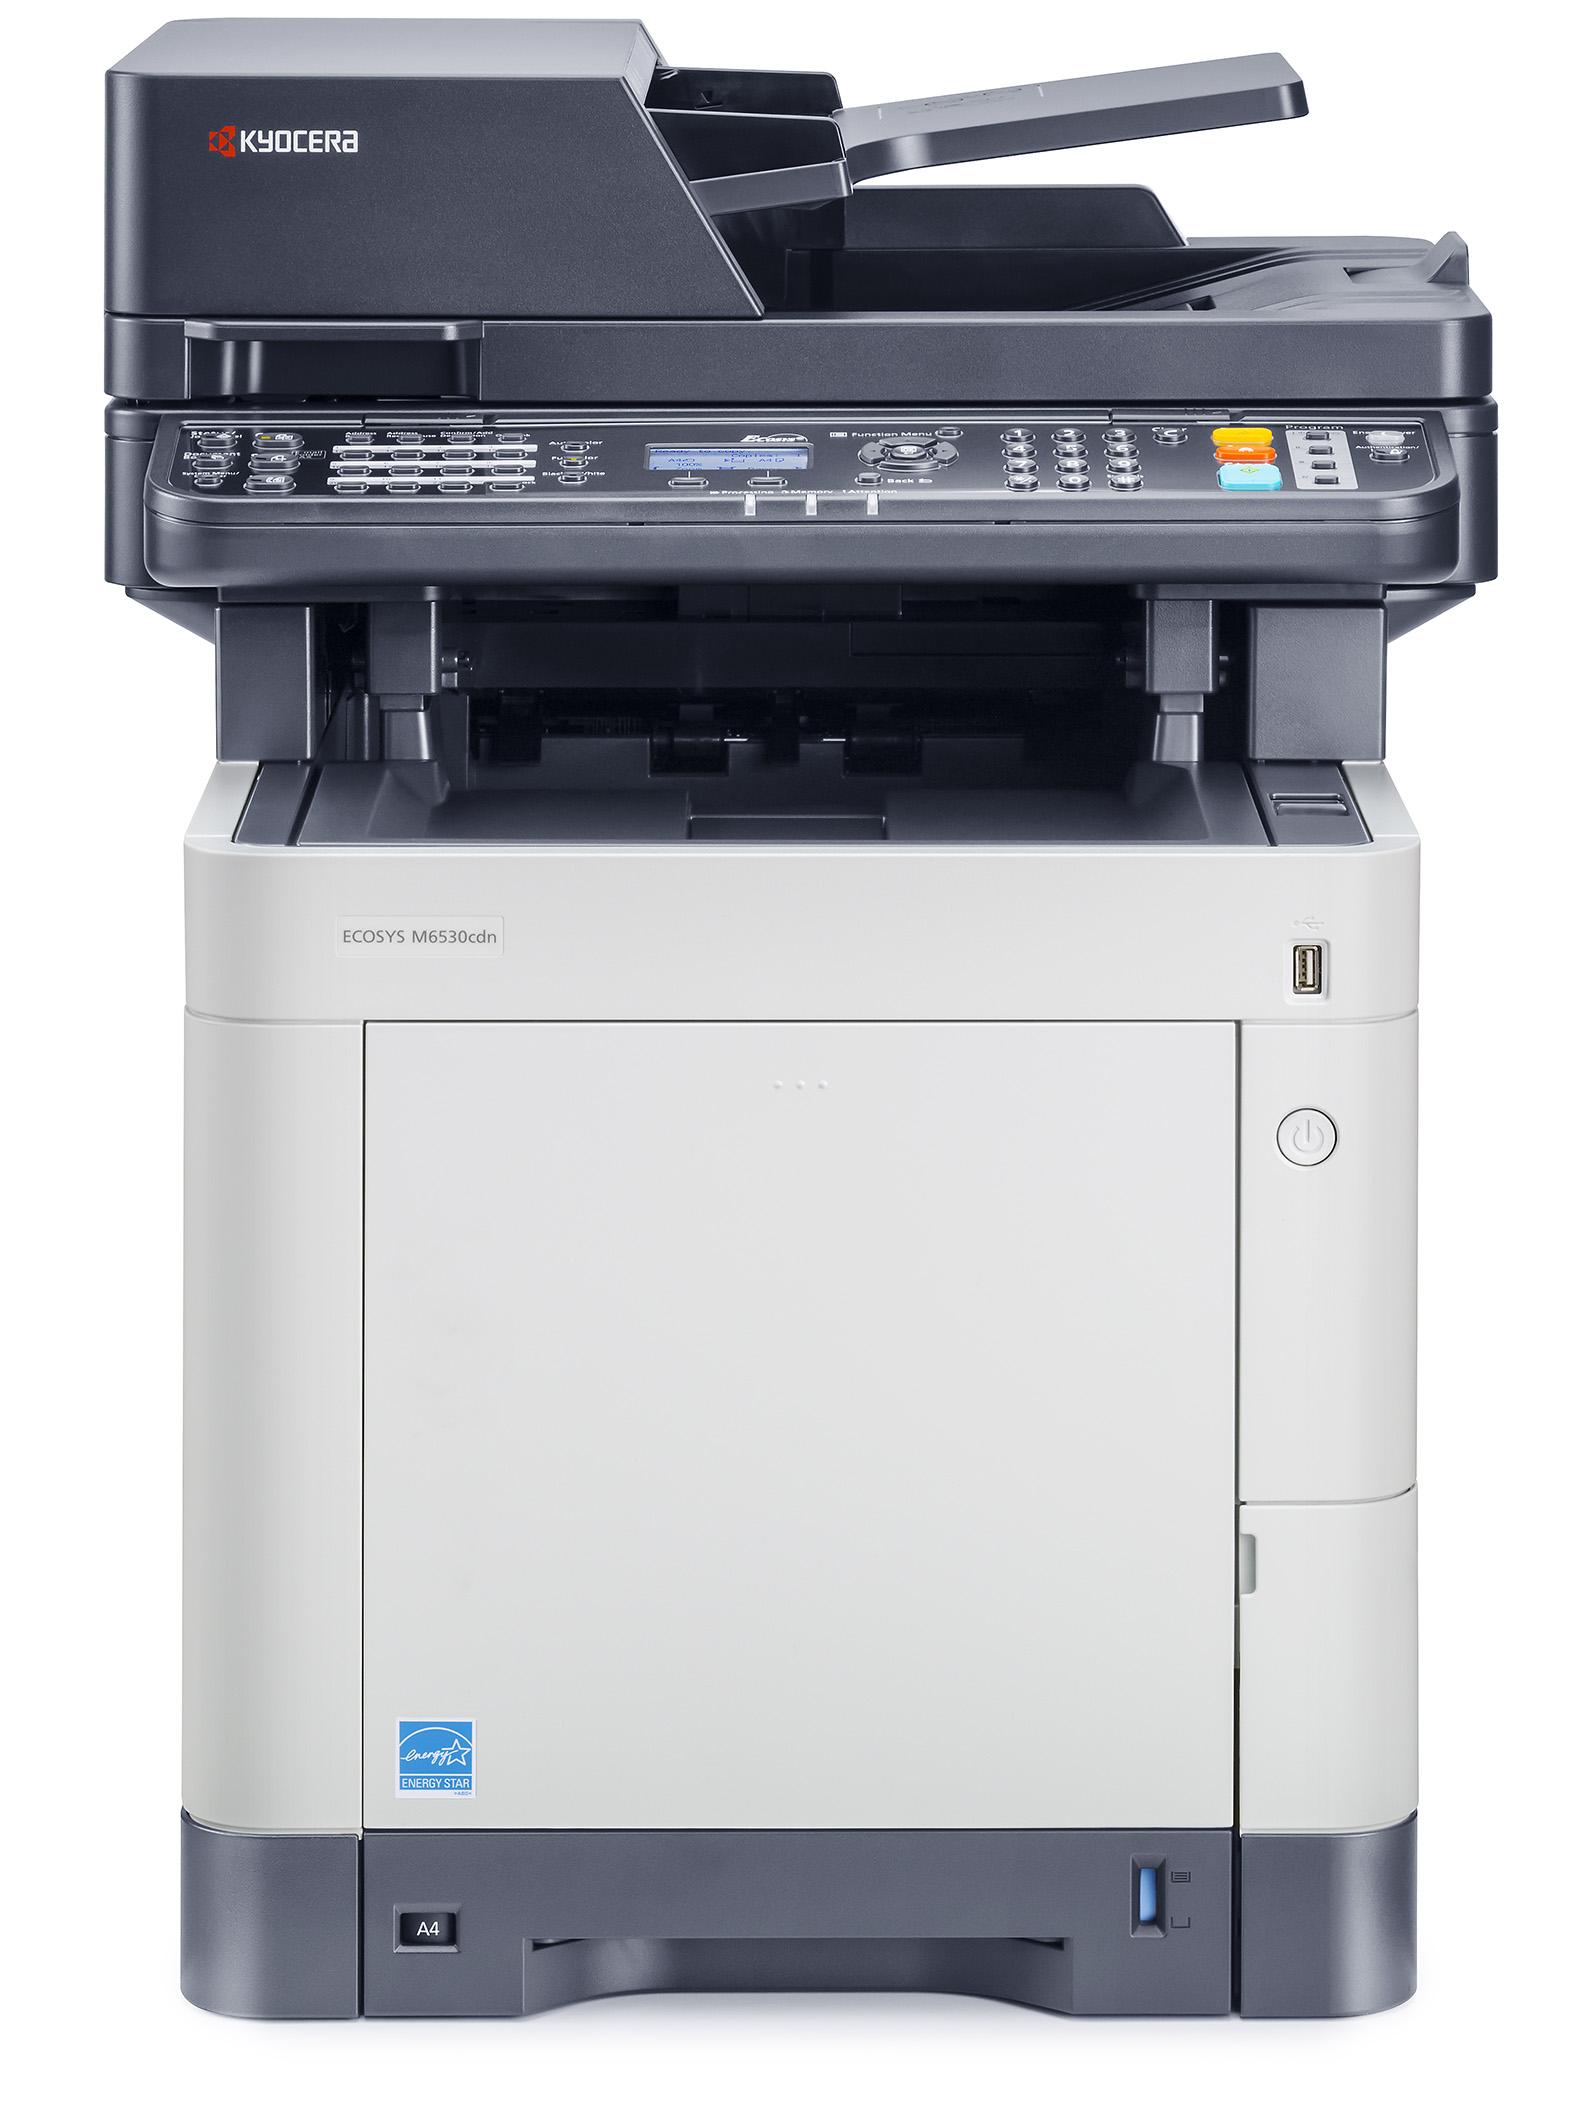 Kyocera ECOSYS M6530cdn A4 Colour Multifunction Printer